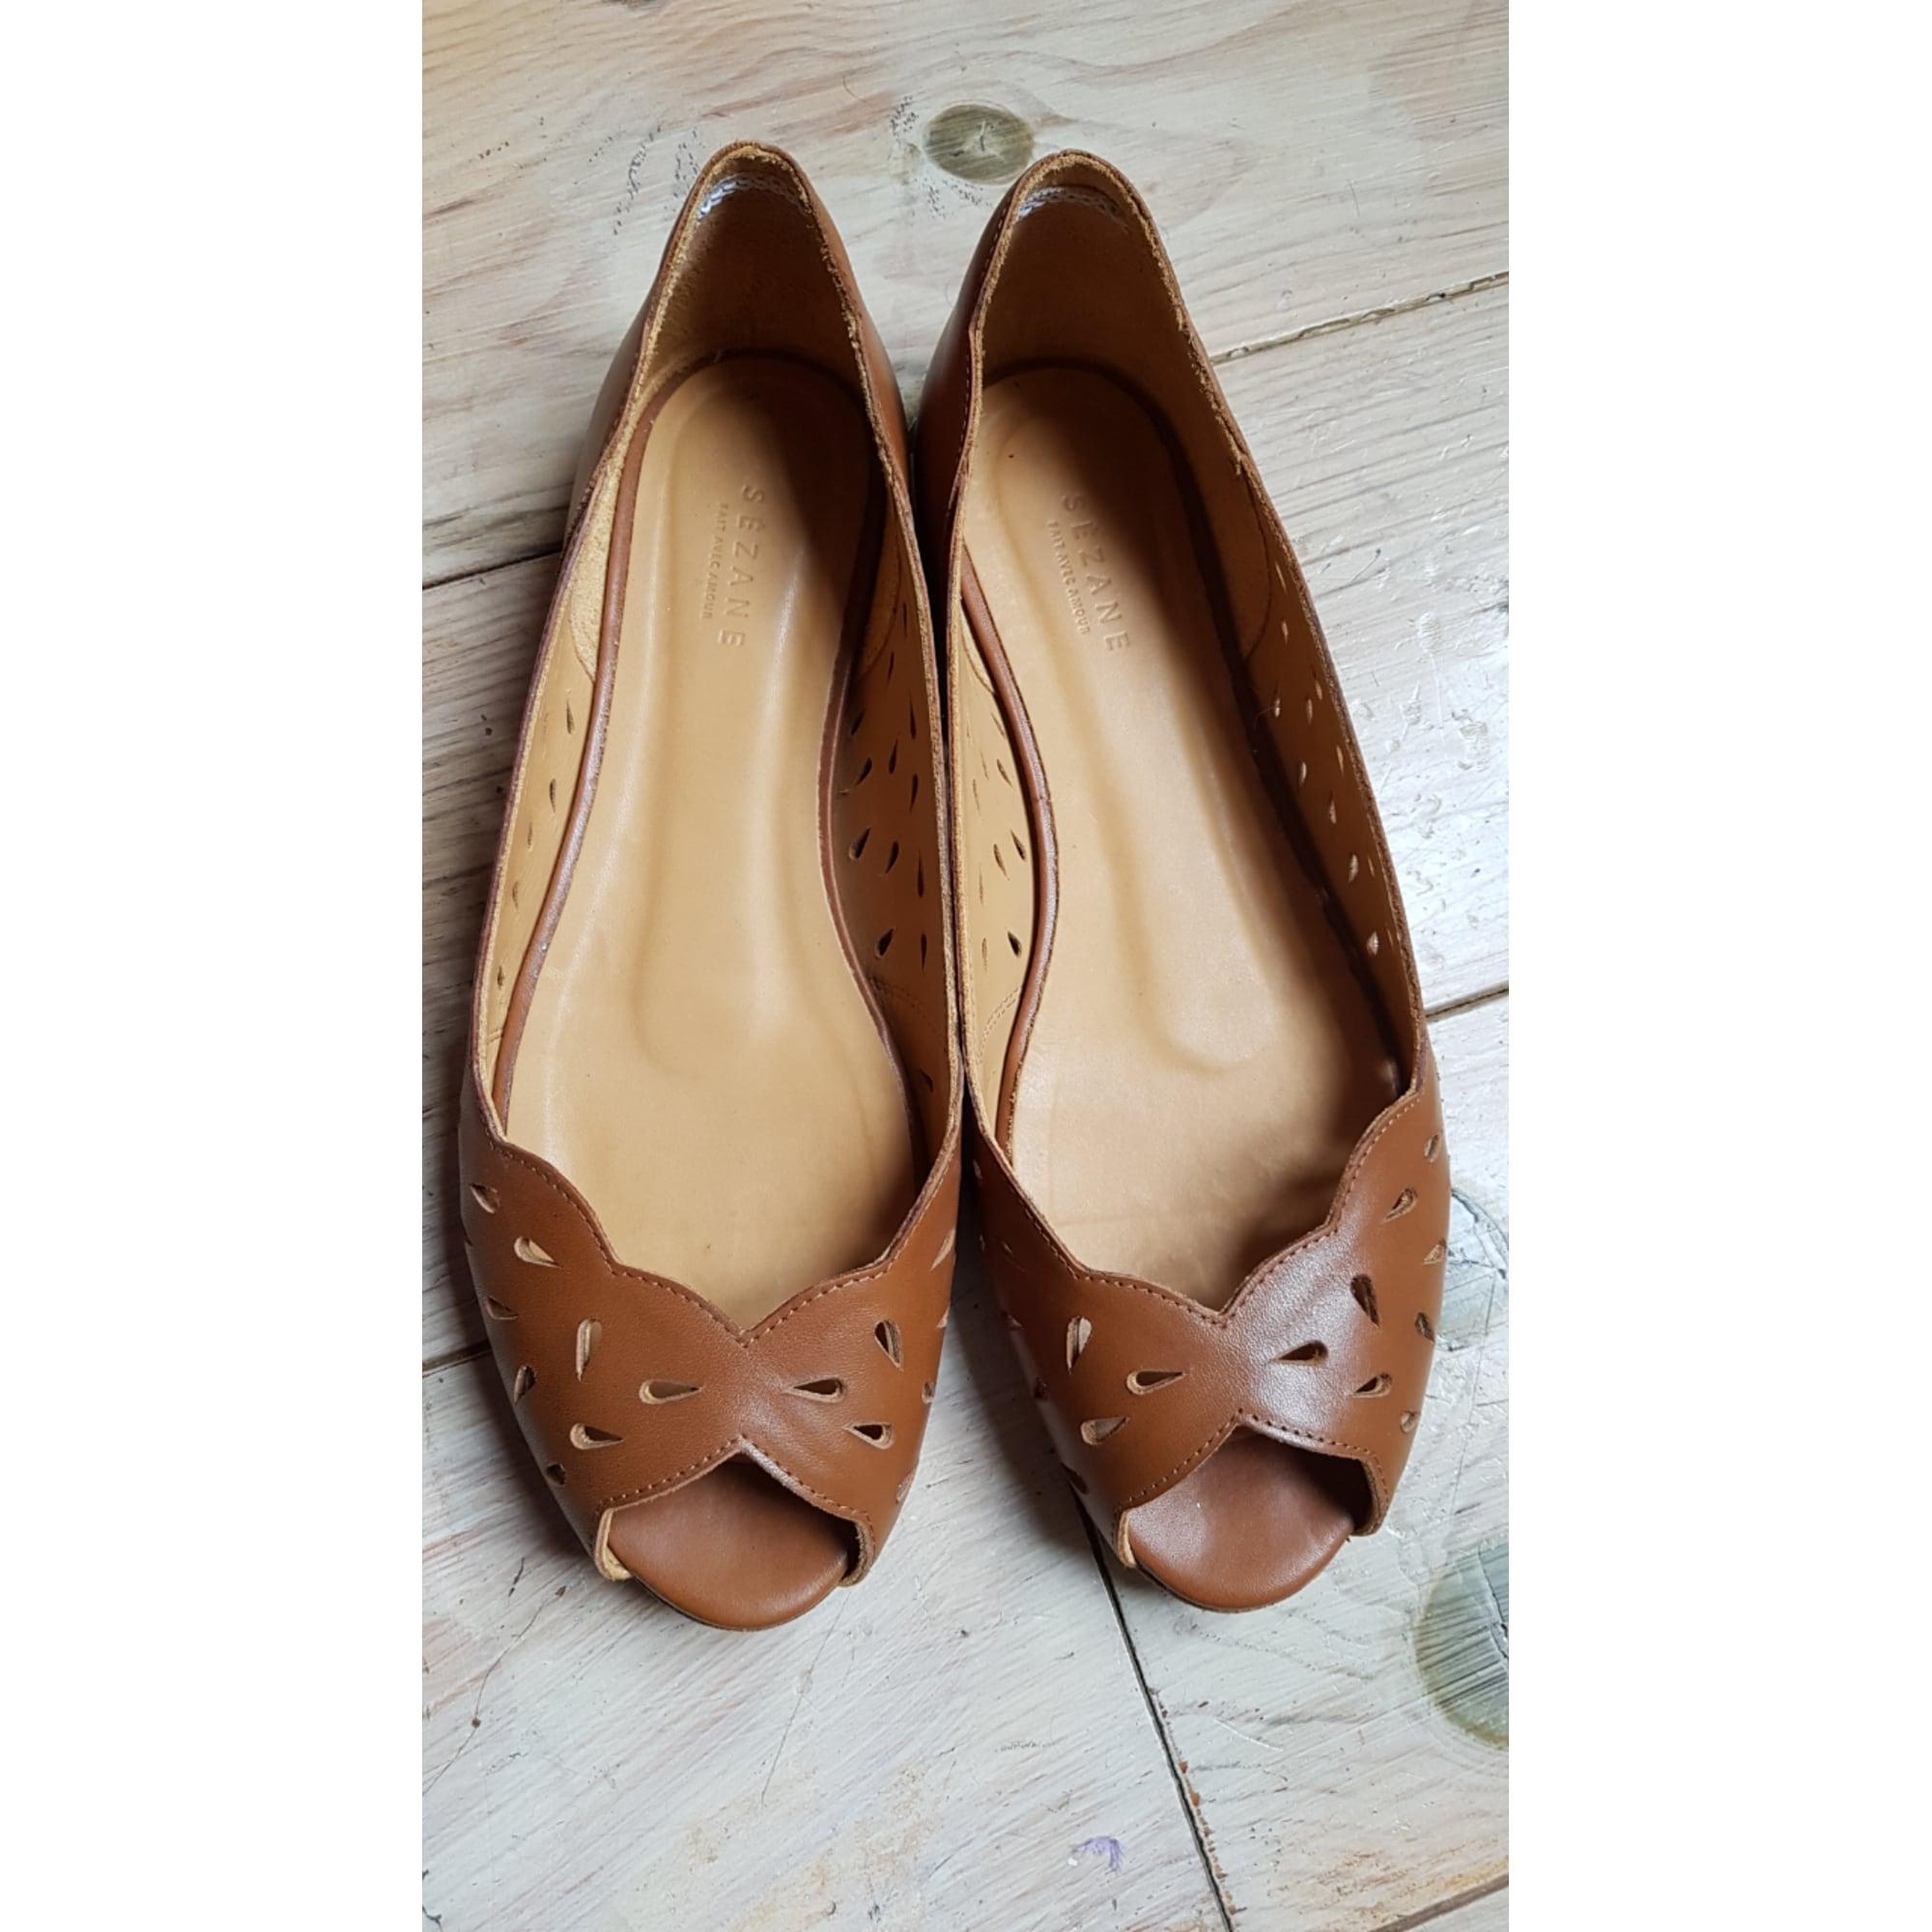 chaussures sézane ballerines